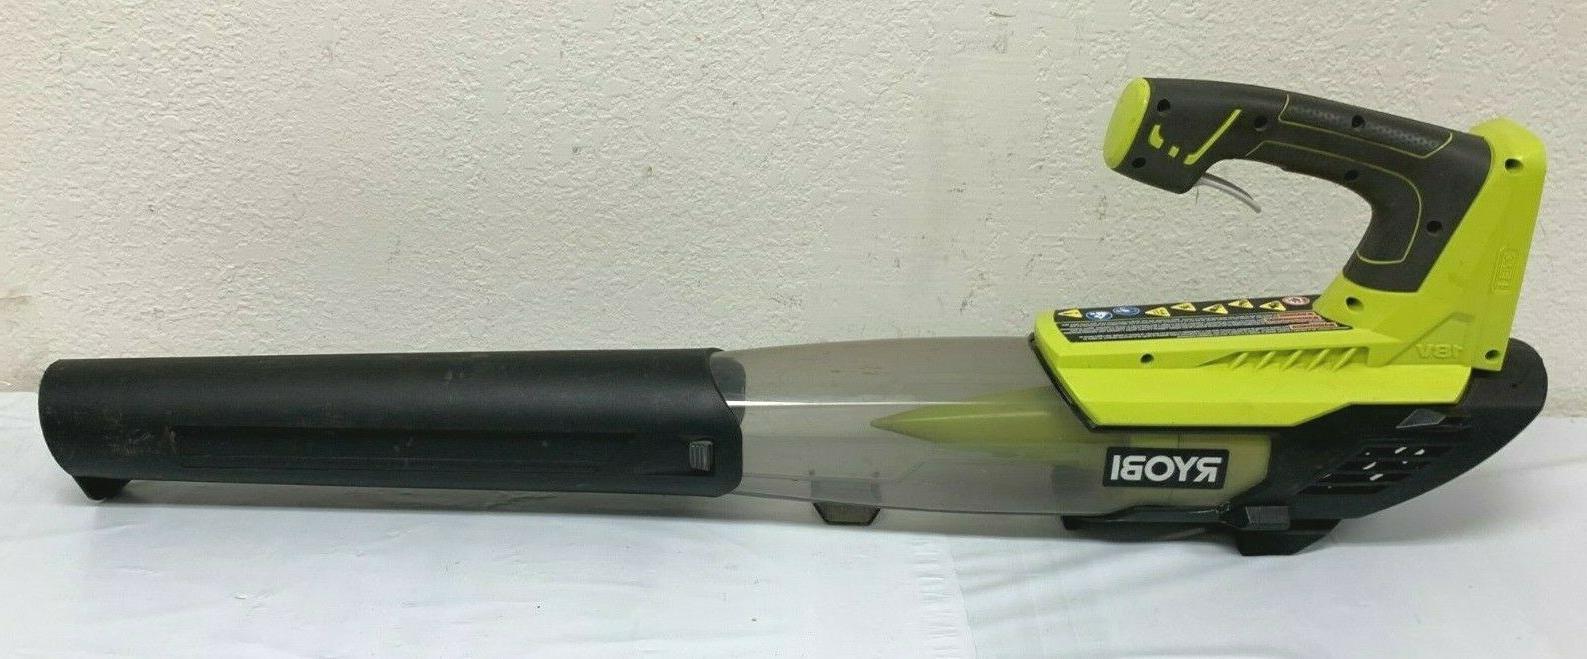 RYOBI P21081 Cordless Fan Leaf Blower Lithium-Ion Speed GR